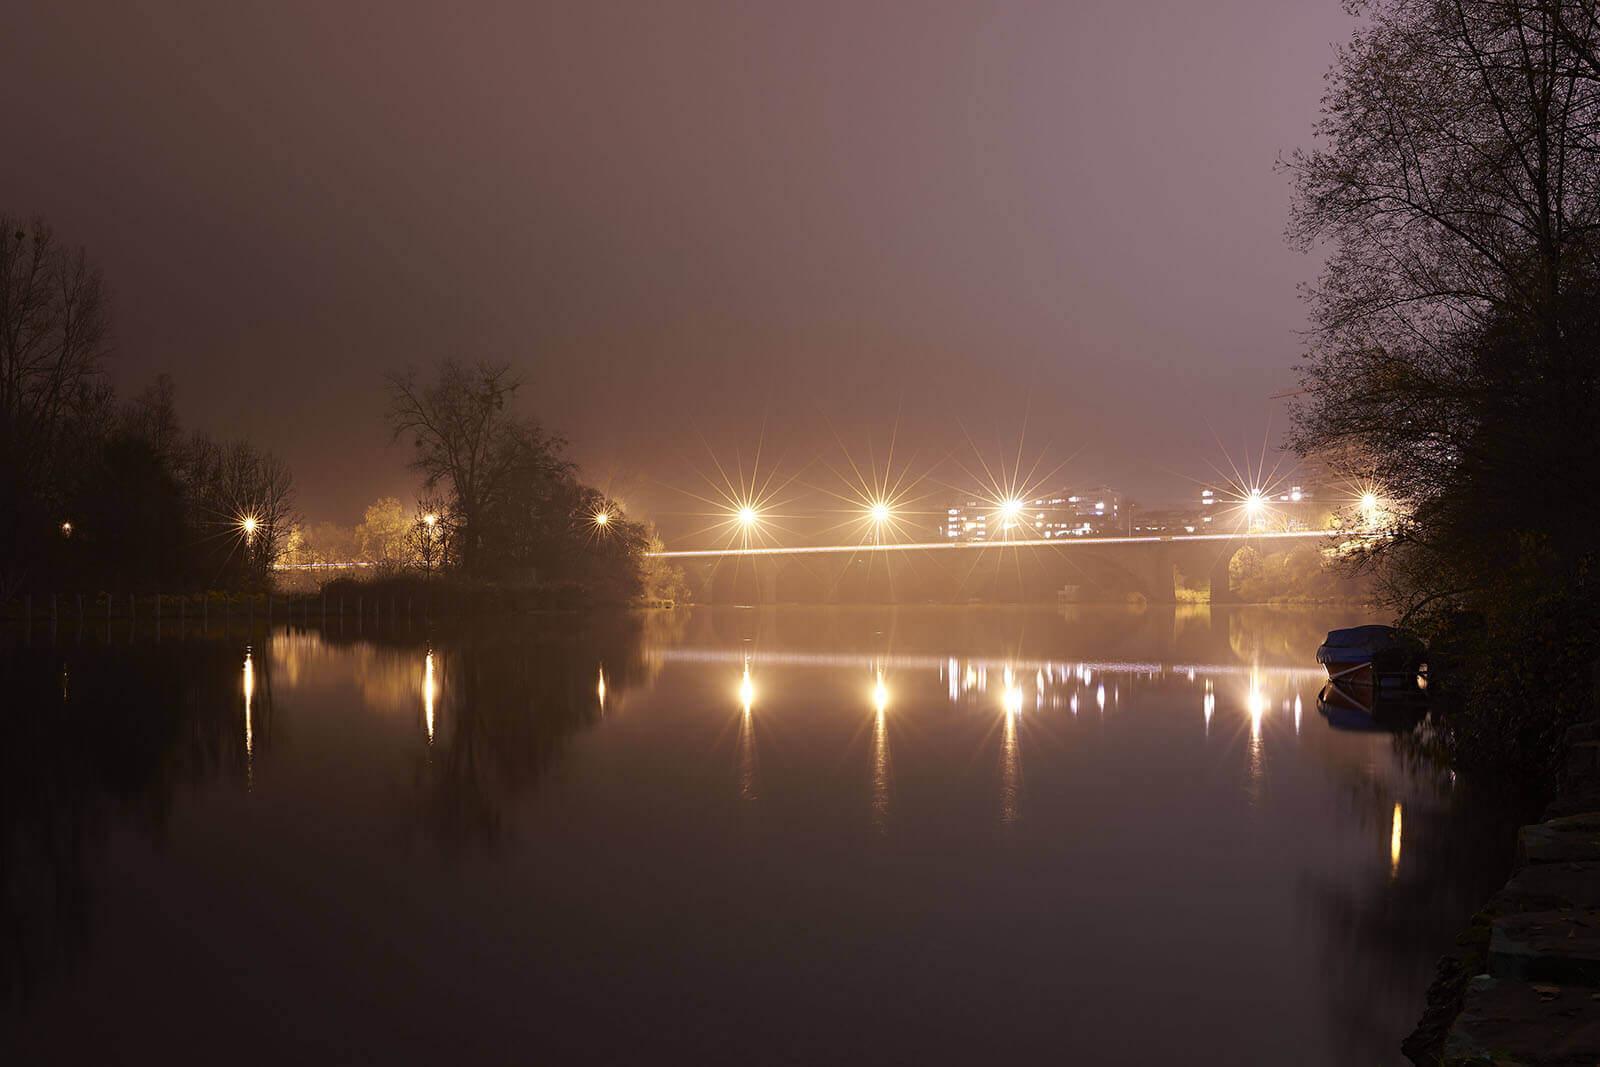 Stadtgrenze_Bern_Kappelenbruecke_02.jpg